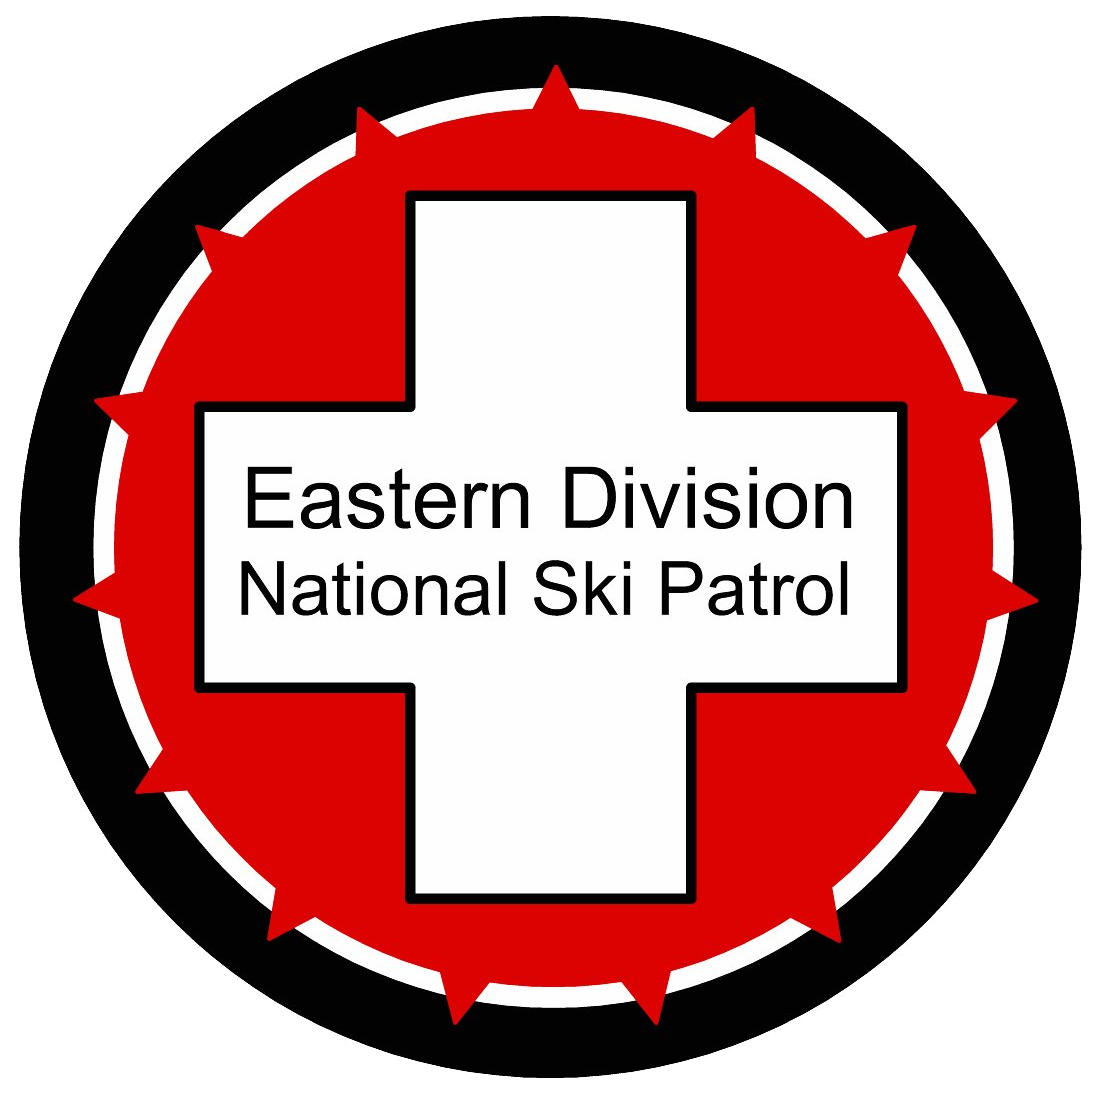 Eastern Division NSP